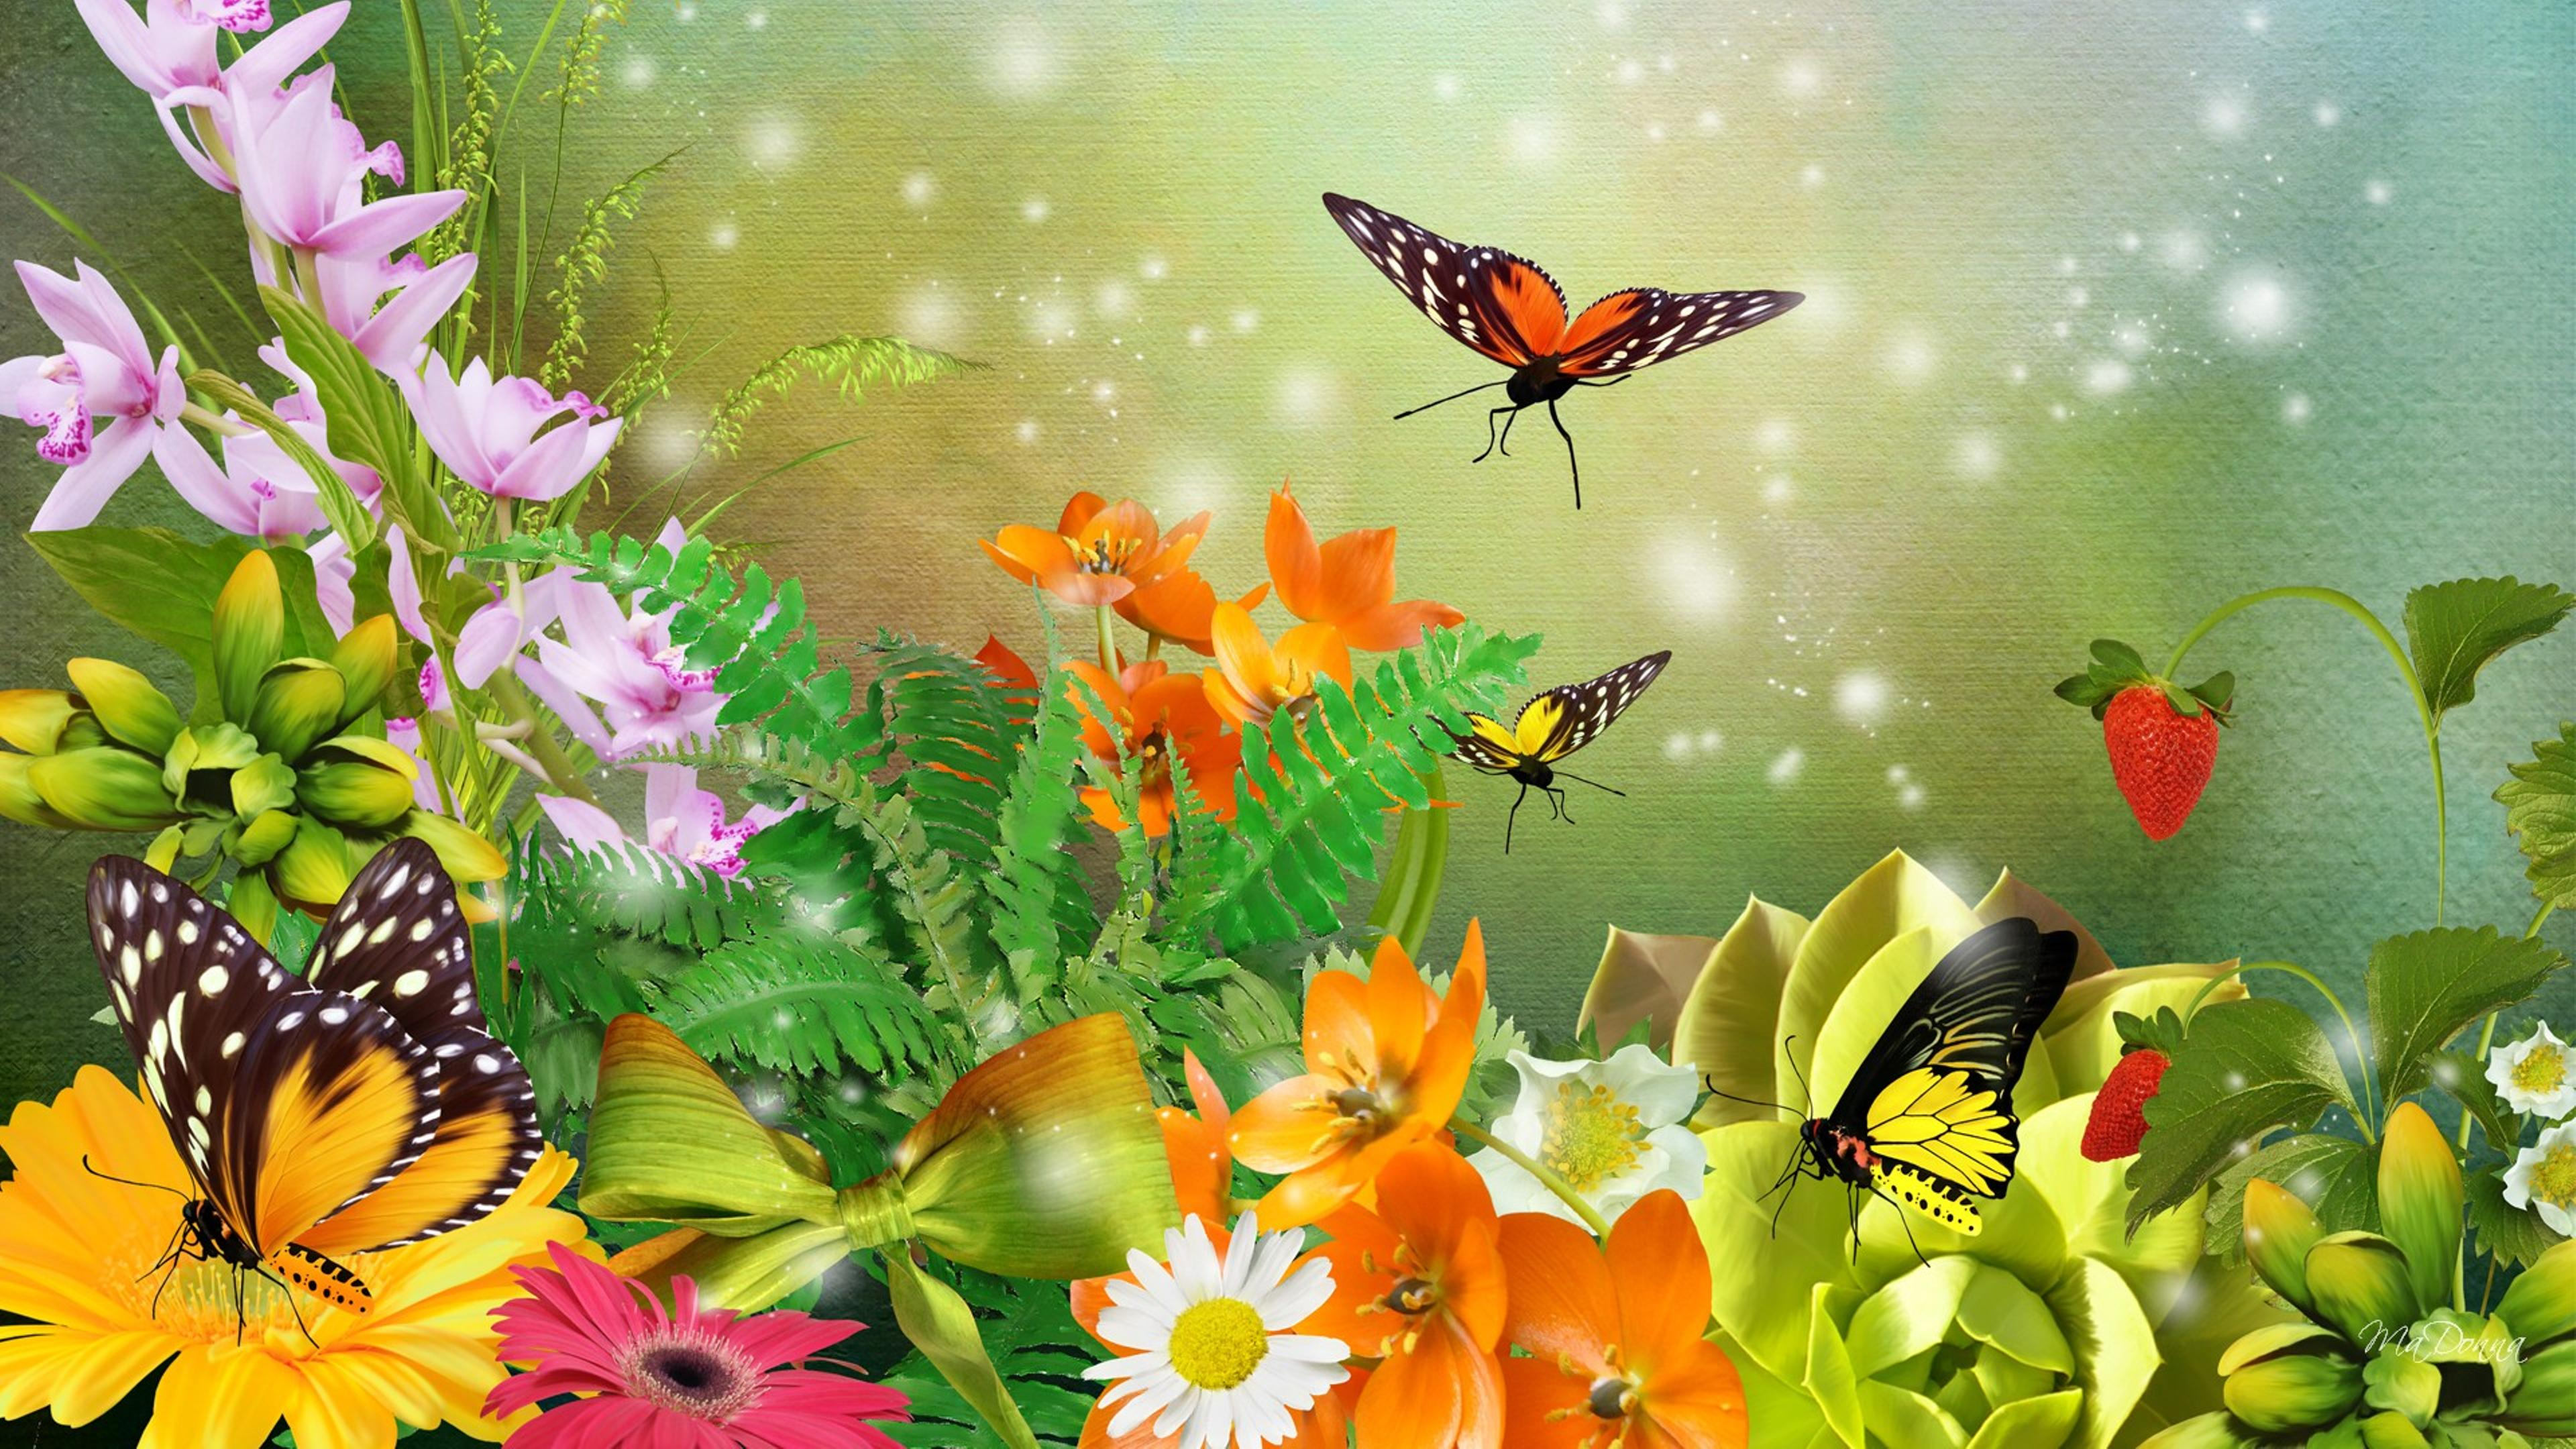 Many Butterflies On The Flowers In The Garden Wallpaper